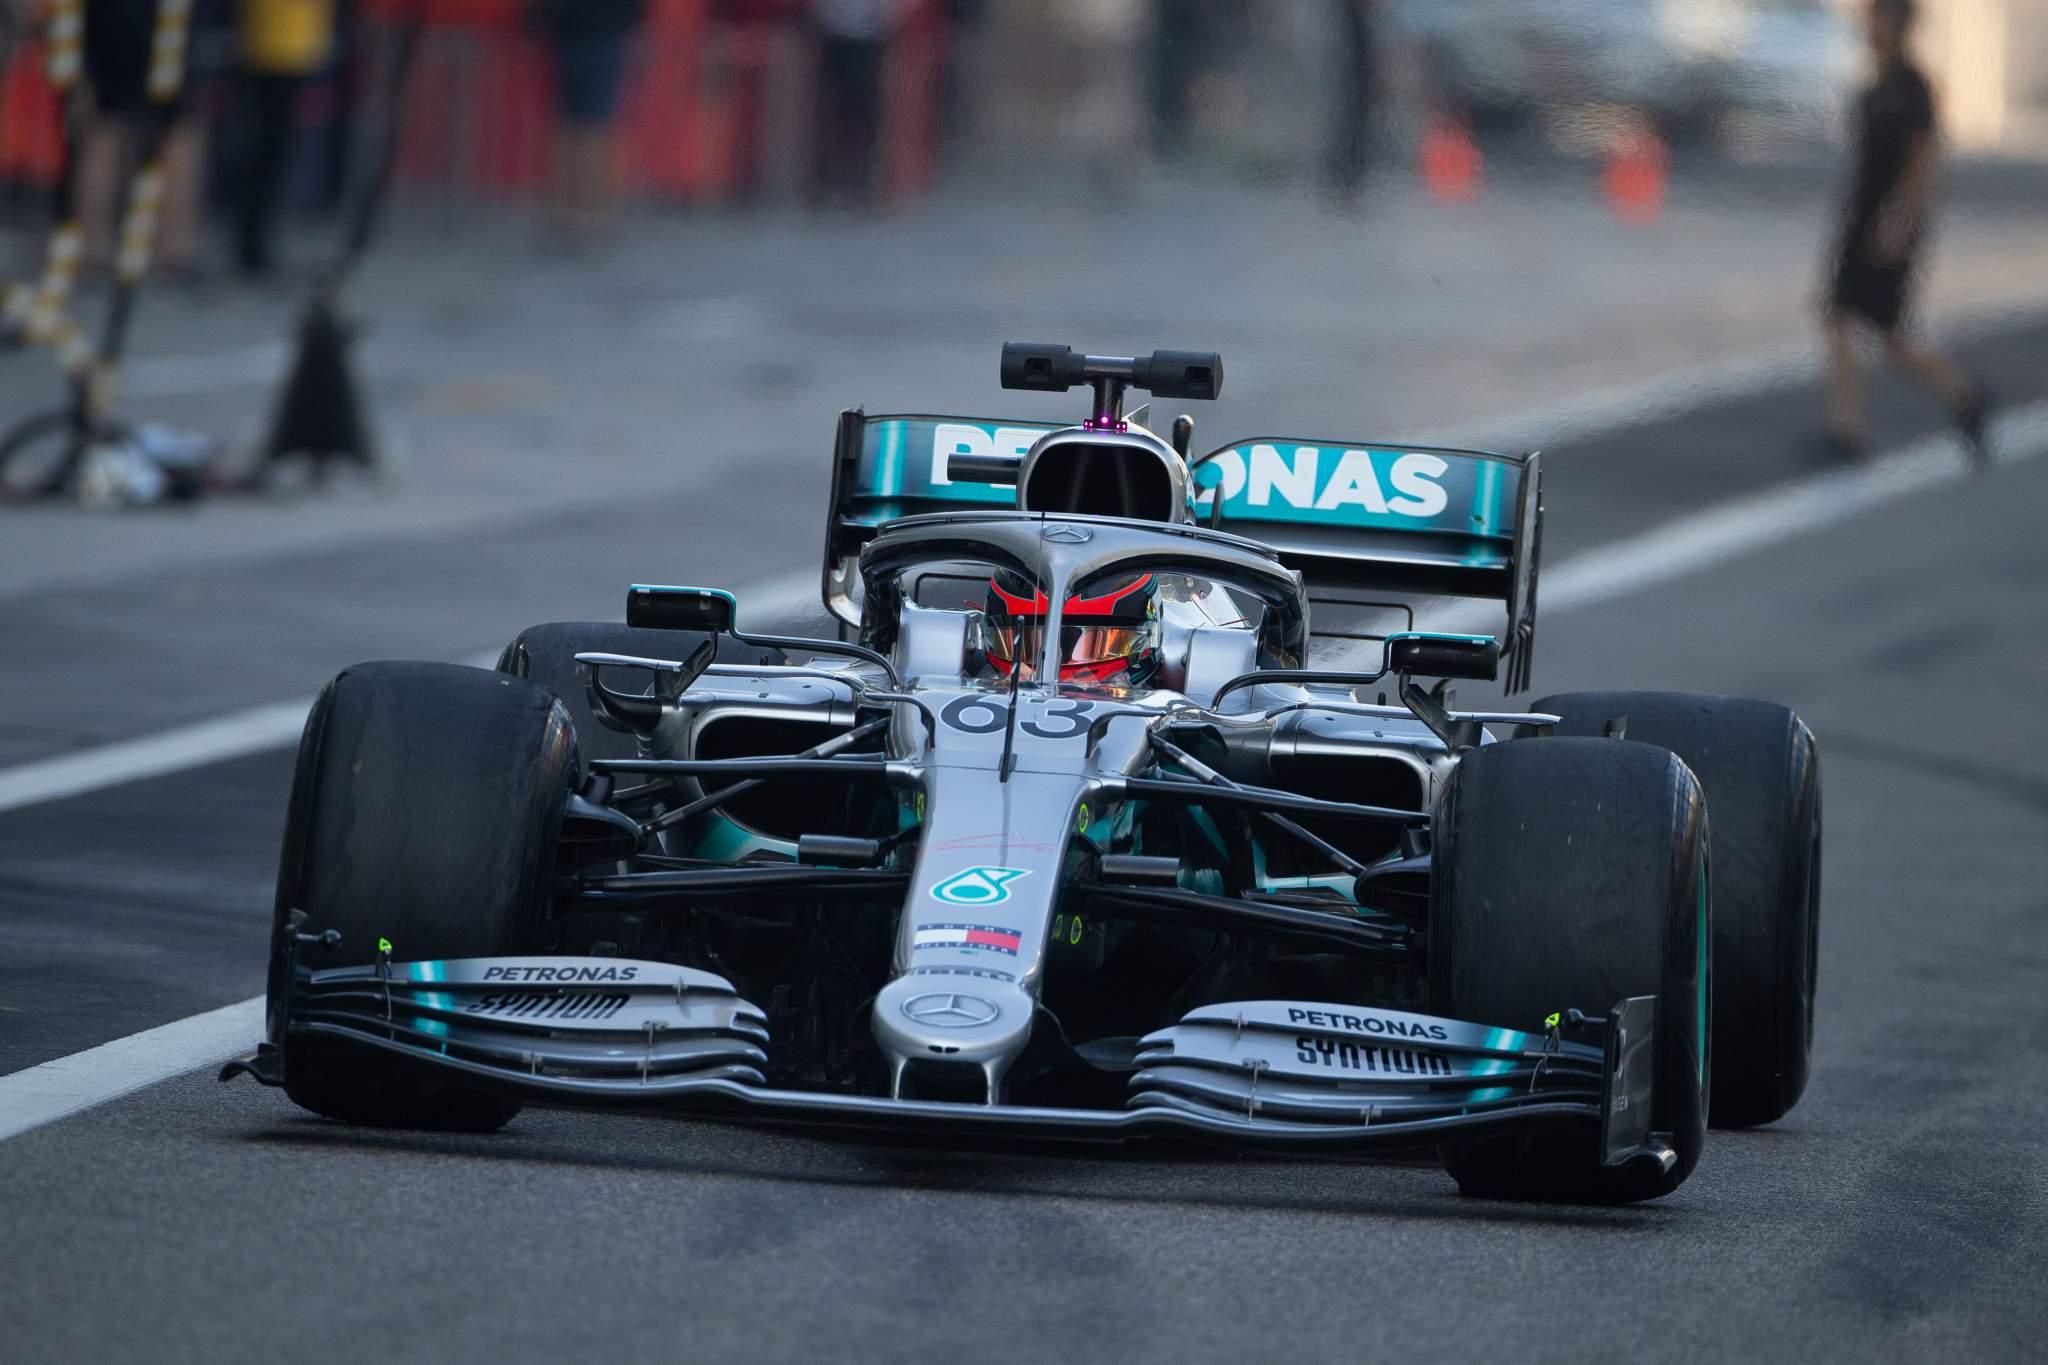 Motor Racing Formula One Testing Abu Dhabi, Uae